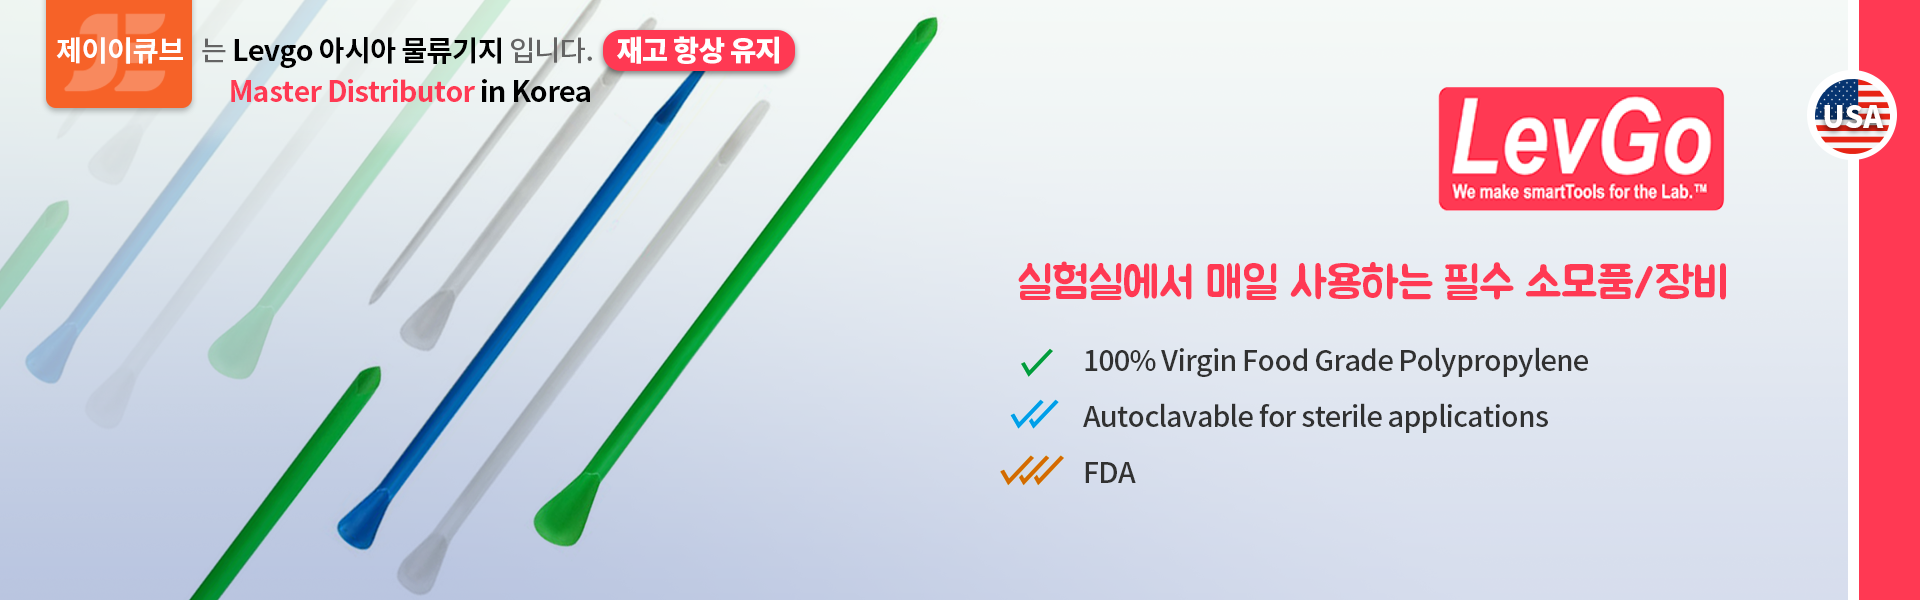 homepage-banner-LEVGO-2